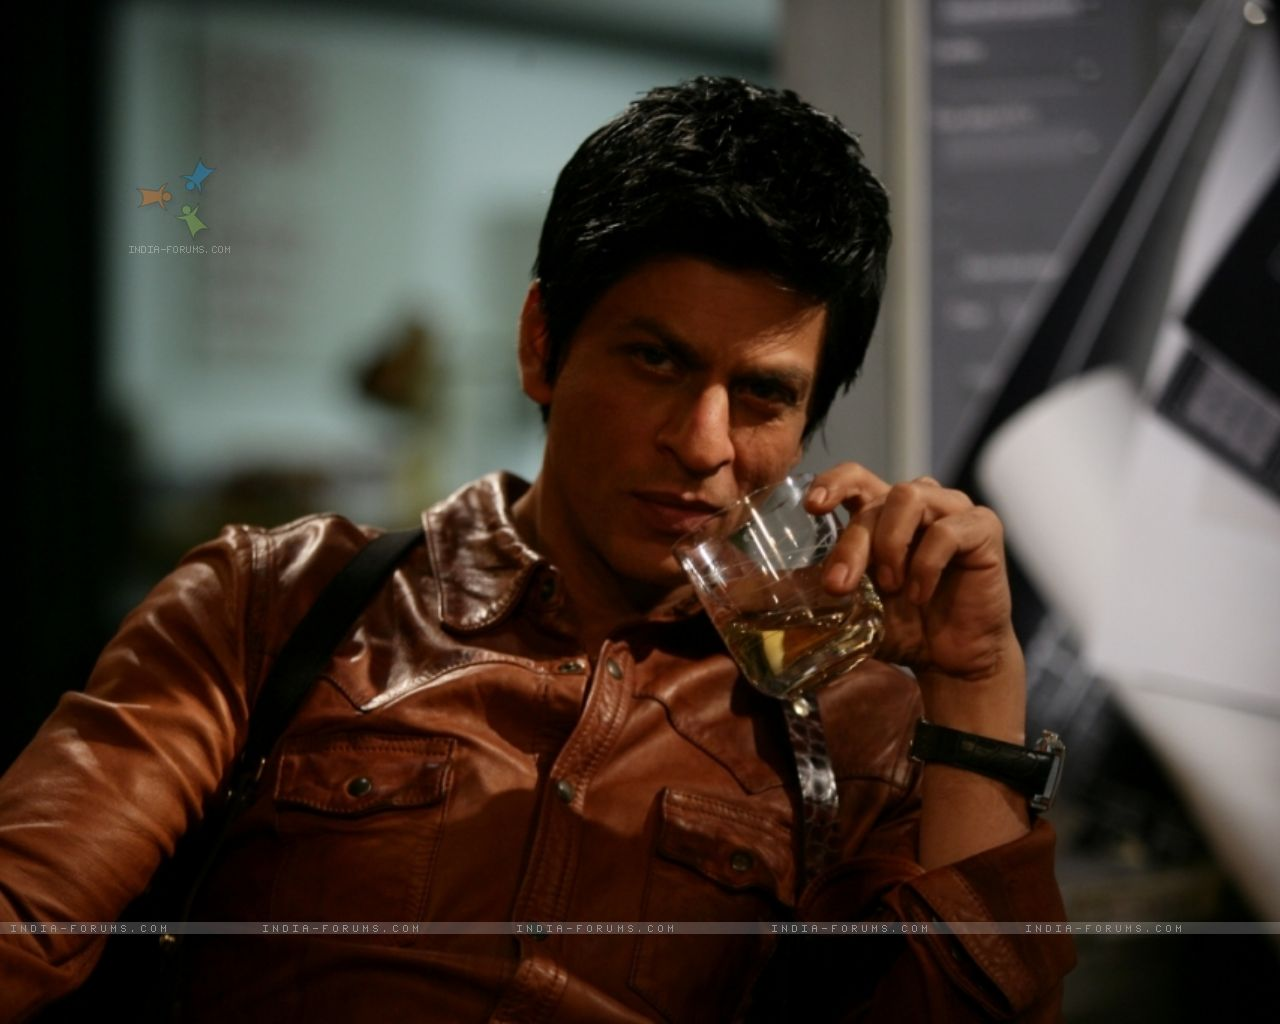 http://2.bp.blogspot.com/-vJFhxi3cvE8/T3vTDCSm8wI/AAAAAAAAAew/PMhxFj314KQ/s1600/Shahrukh+Khan+Wallpapers+HD+(6).jpg